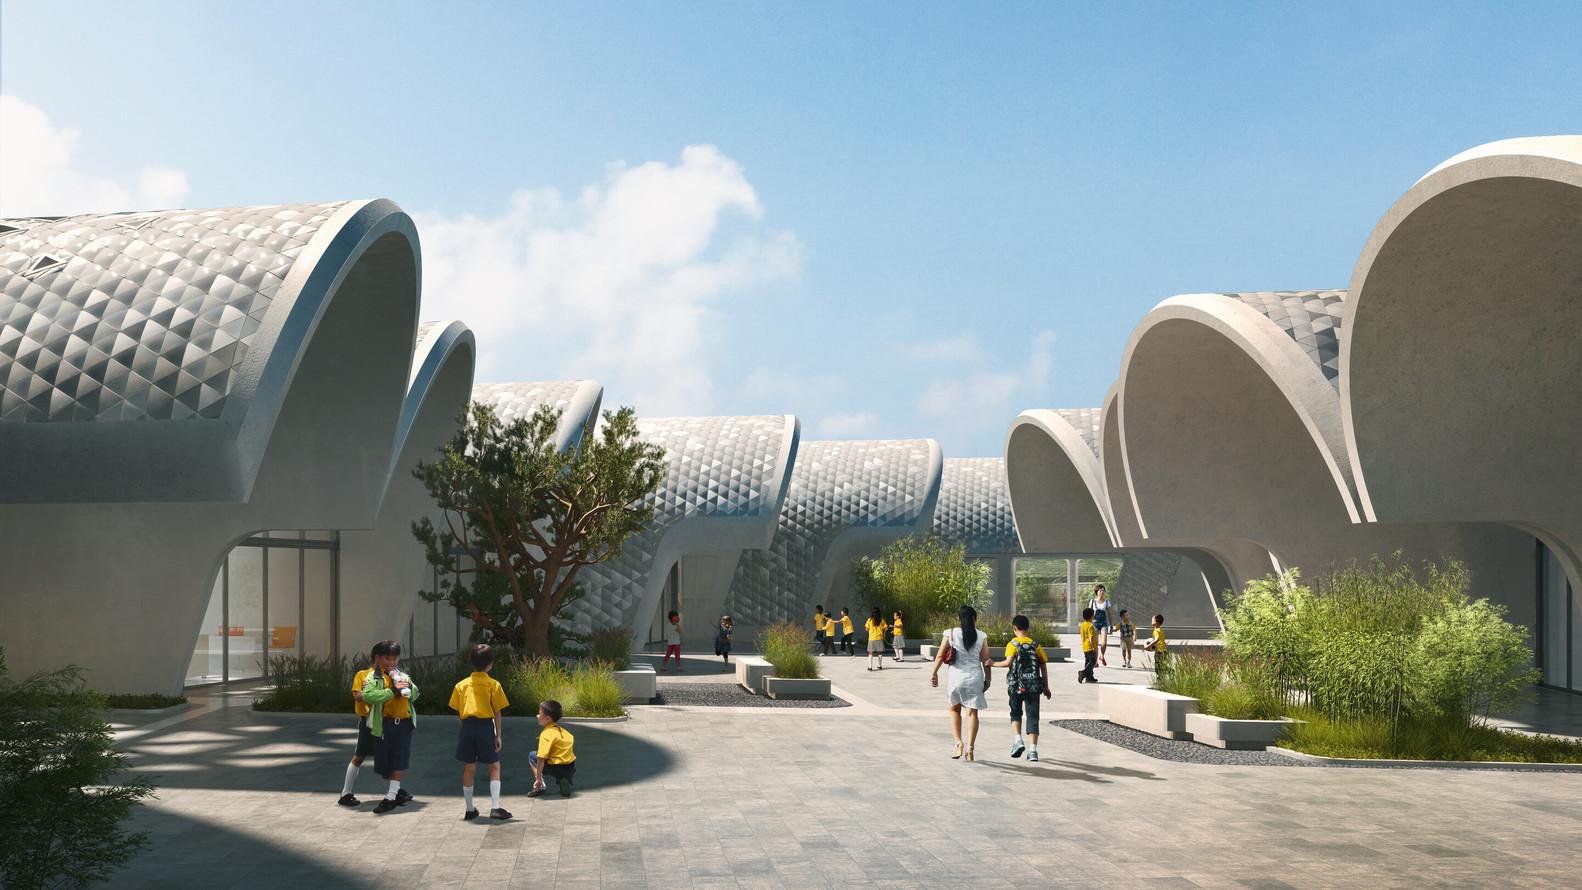 Zaha Hadid Architects Designs Parabolic Vaulted School Campus In Rural  China,© VA